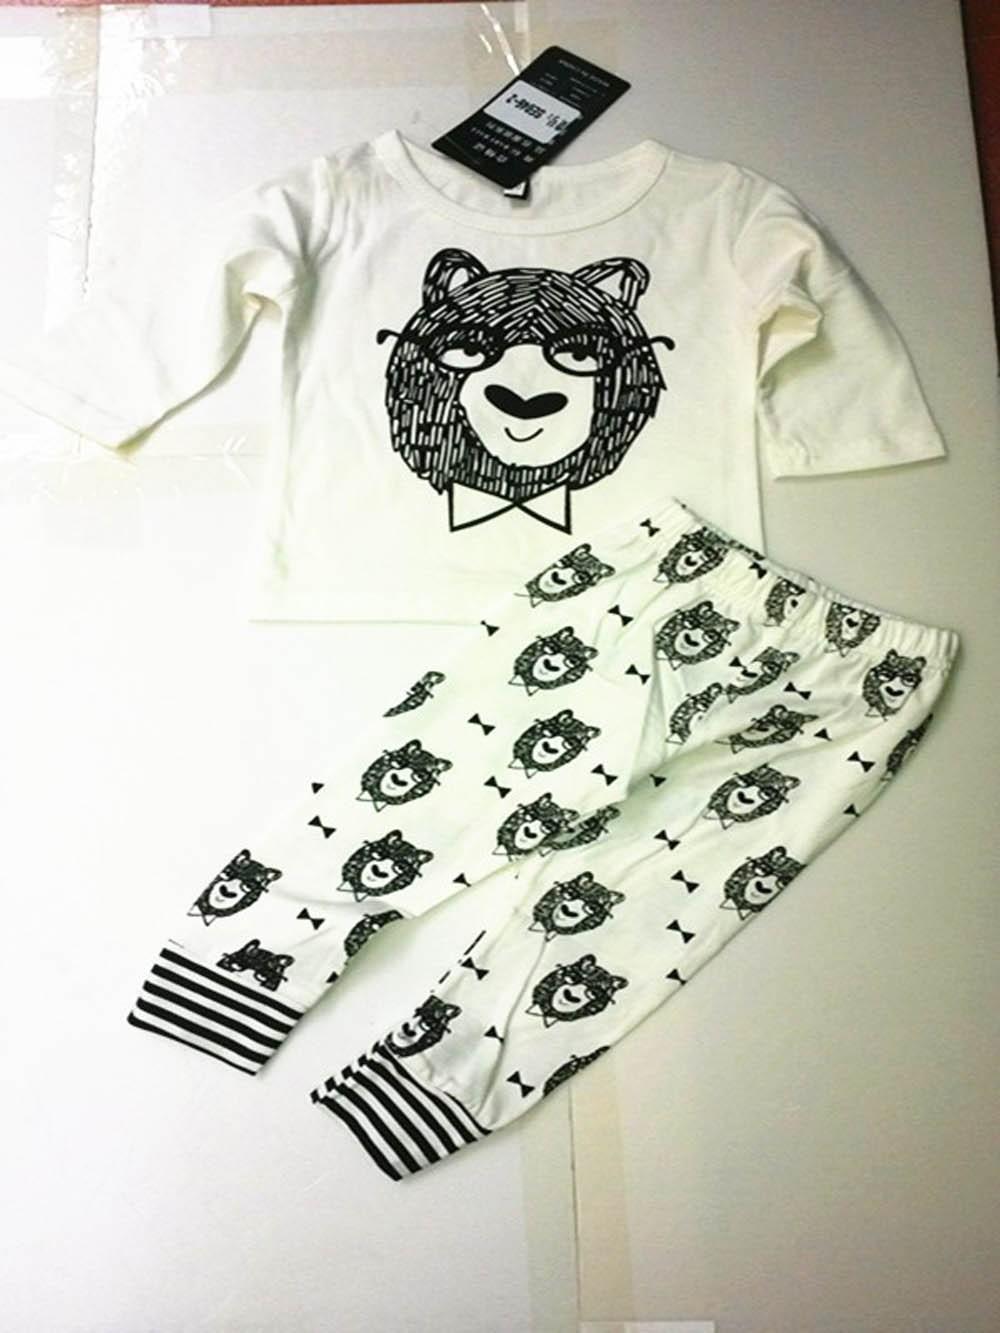 2015-New-Autumn-Baby-Cotton-Little-Monster-Clothes-2pcs-Top+Pants-Sport-Suits-Infant-Boys-And-Girls-Clothing-Sets-CL0769 (22)